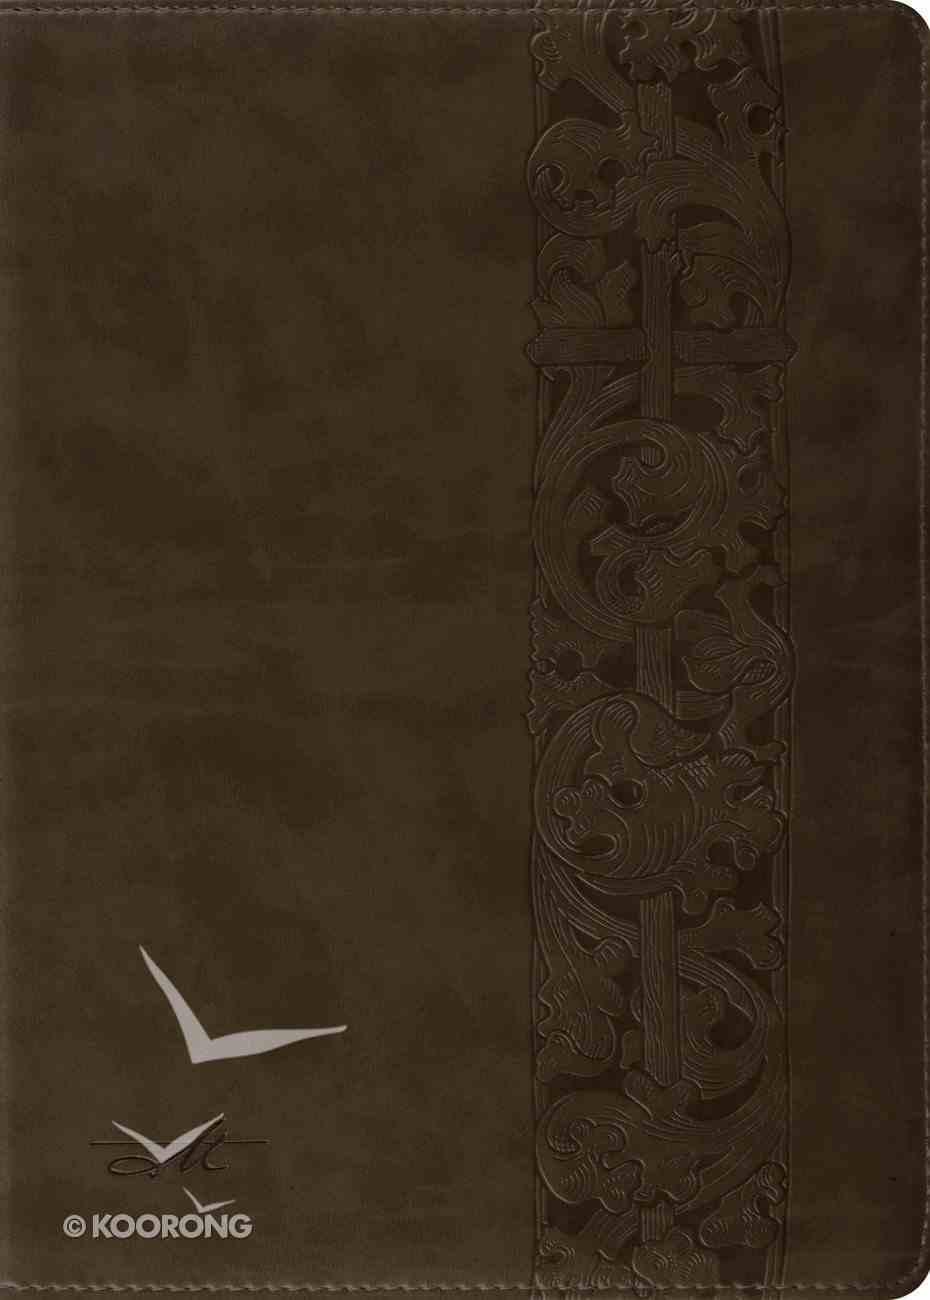 ESV Macarthur Study Bible Trutone Olive Woodcut Design Imitation Leather